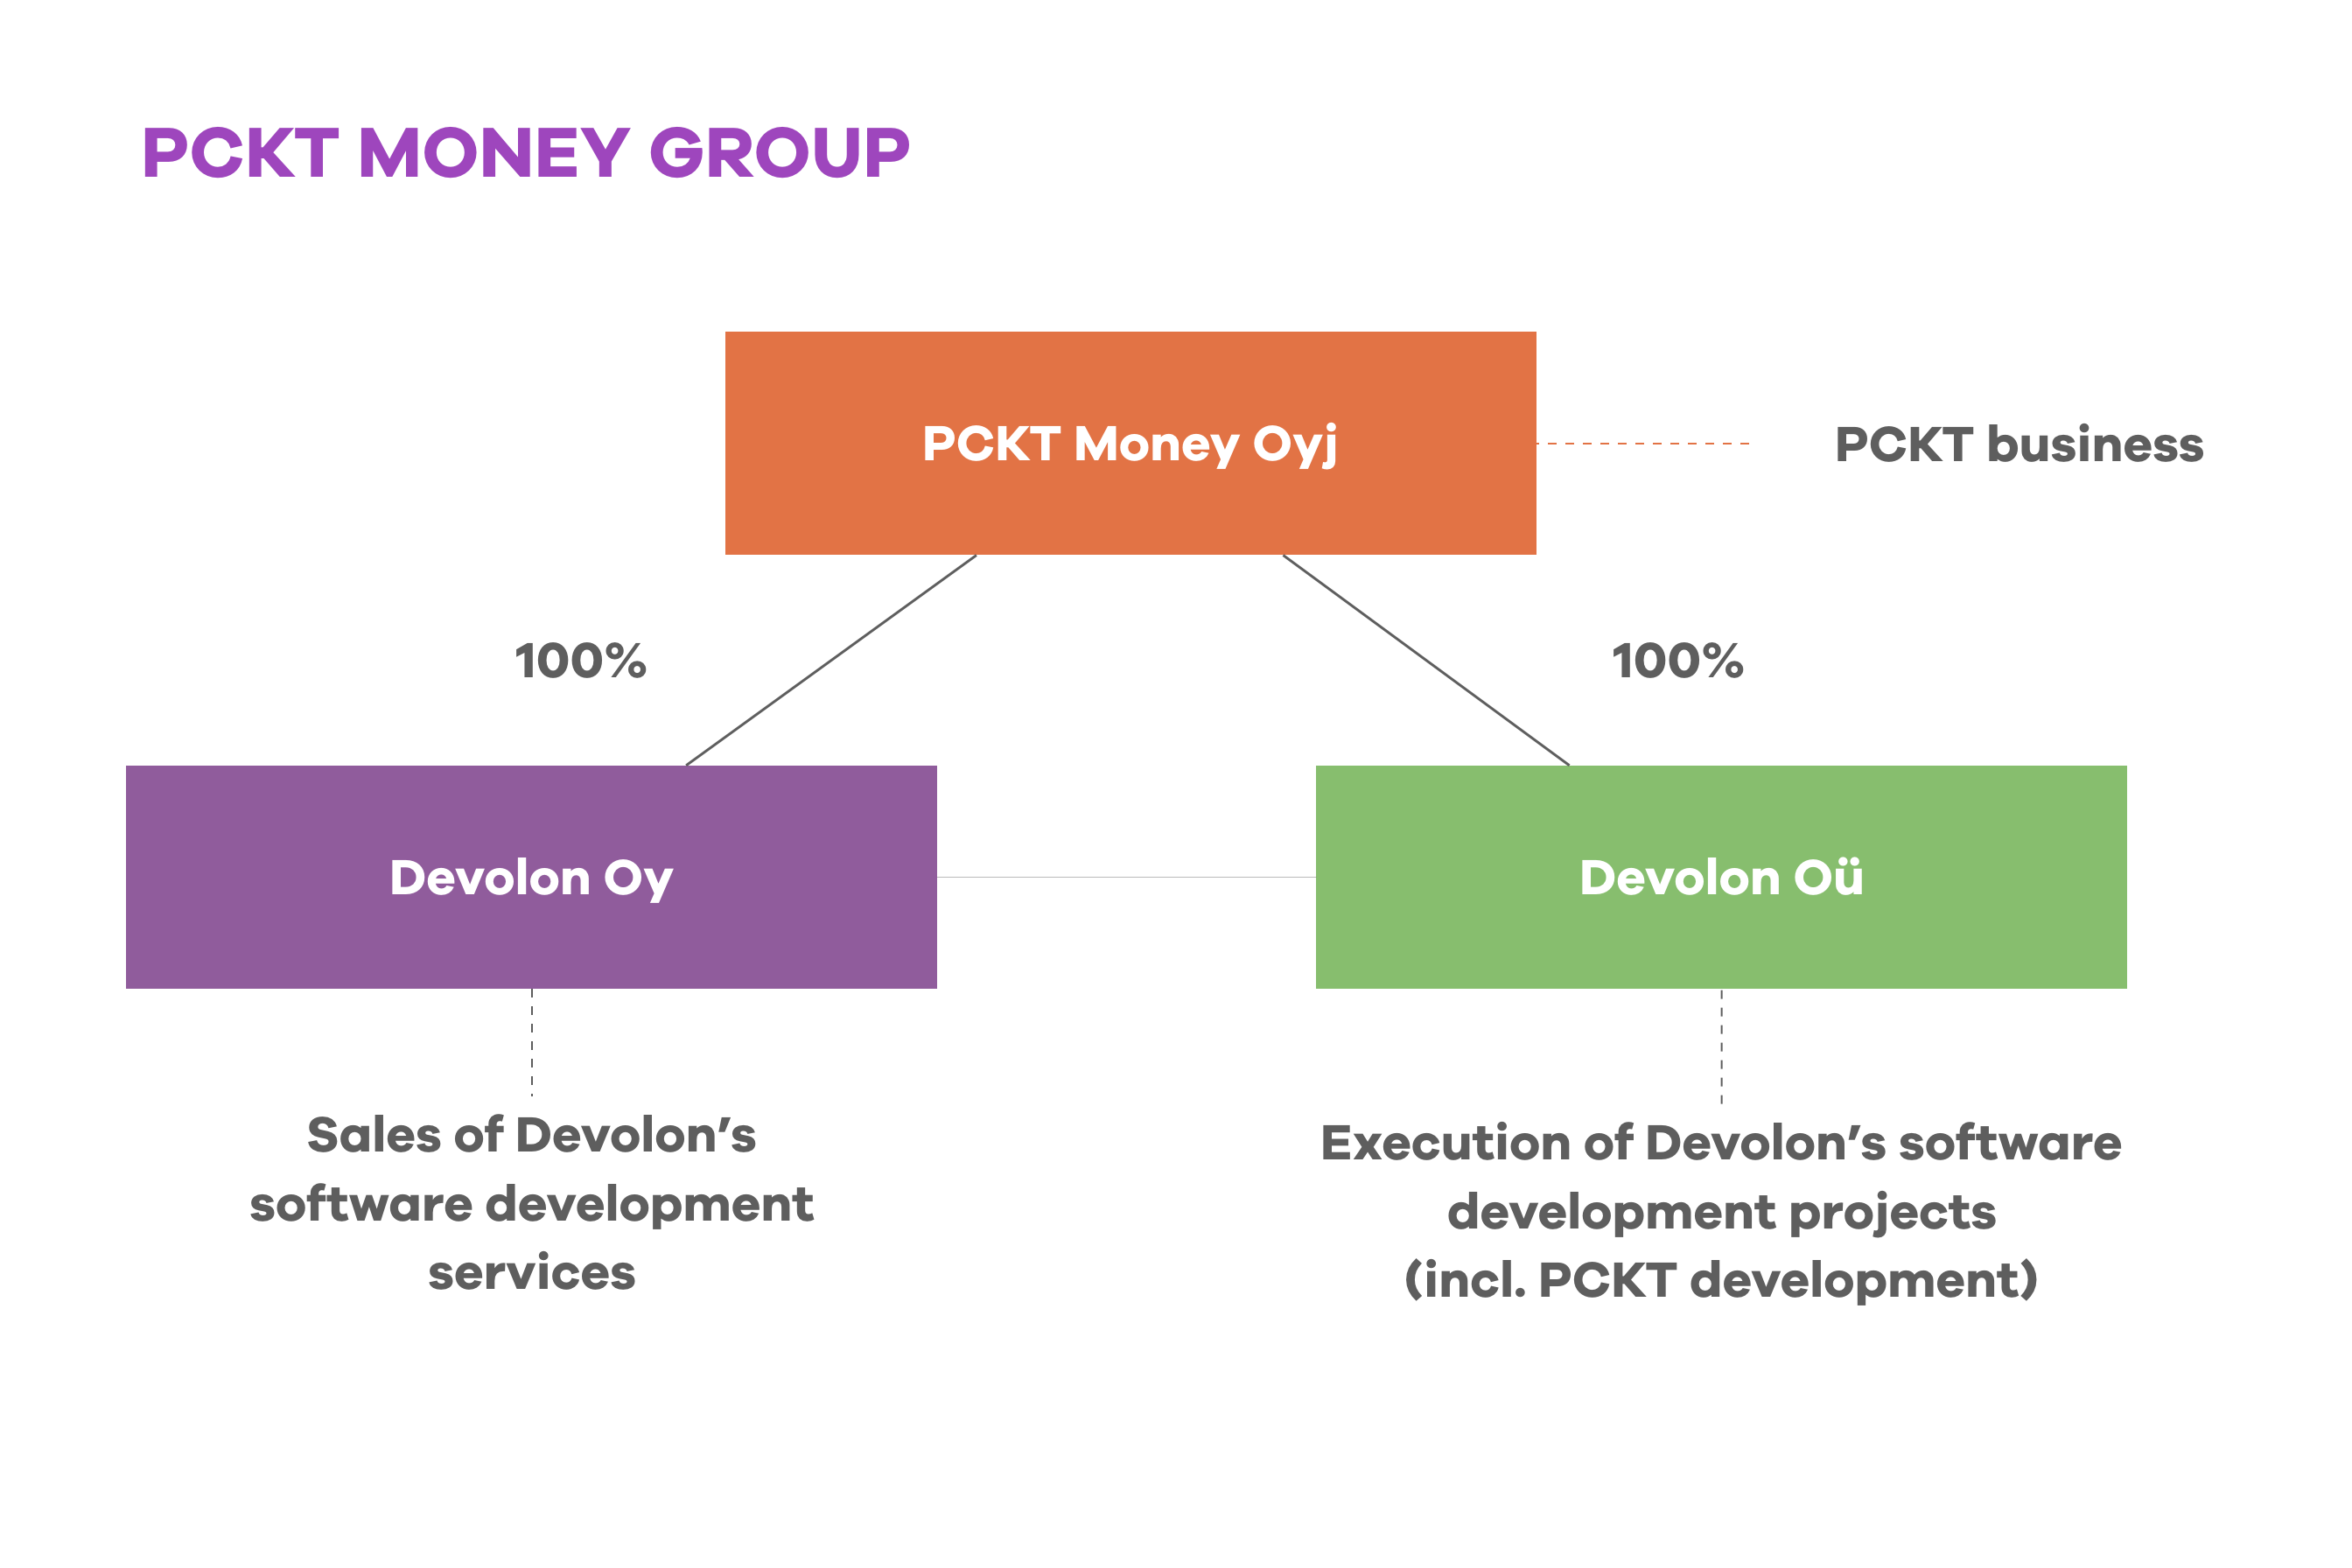 PCKT Money Group